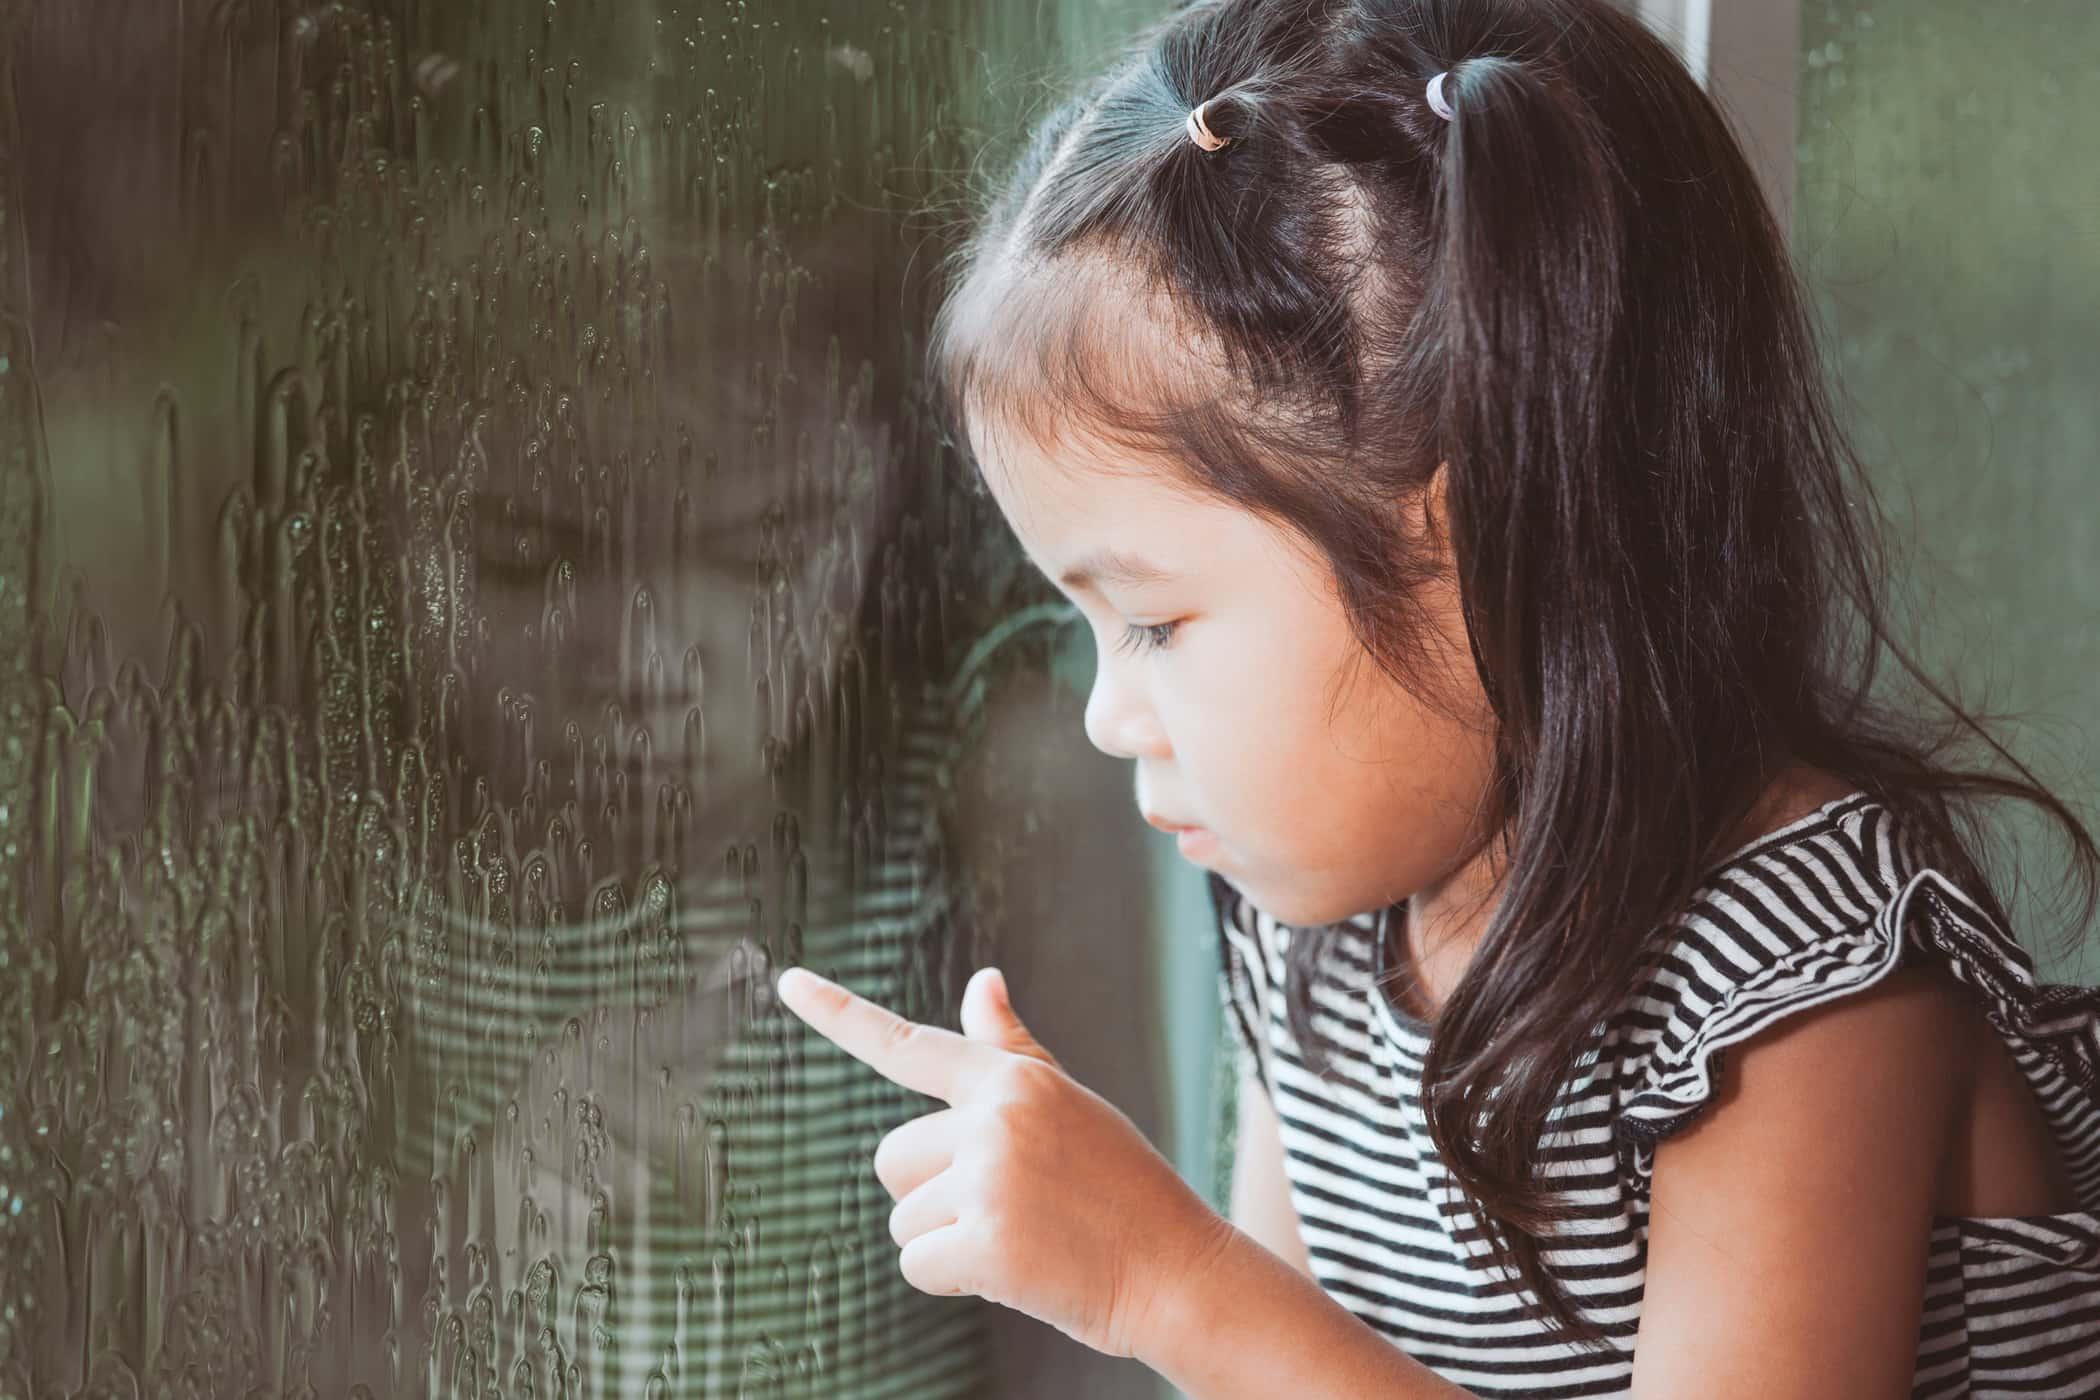 https: img-z.okeinfo.net content 2017 07 16 481 1737420 anak-bisa-juga-stres-simak-8-tanda-tandanya-yang-wajib-orangtua-tahu-zV0NbDaBiO.jpg